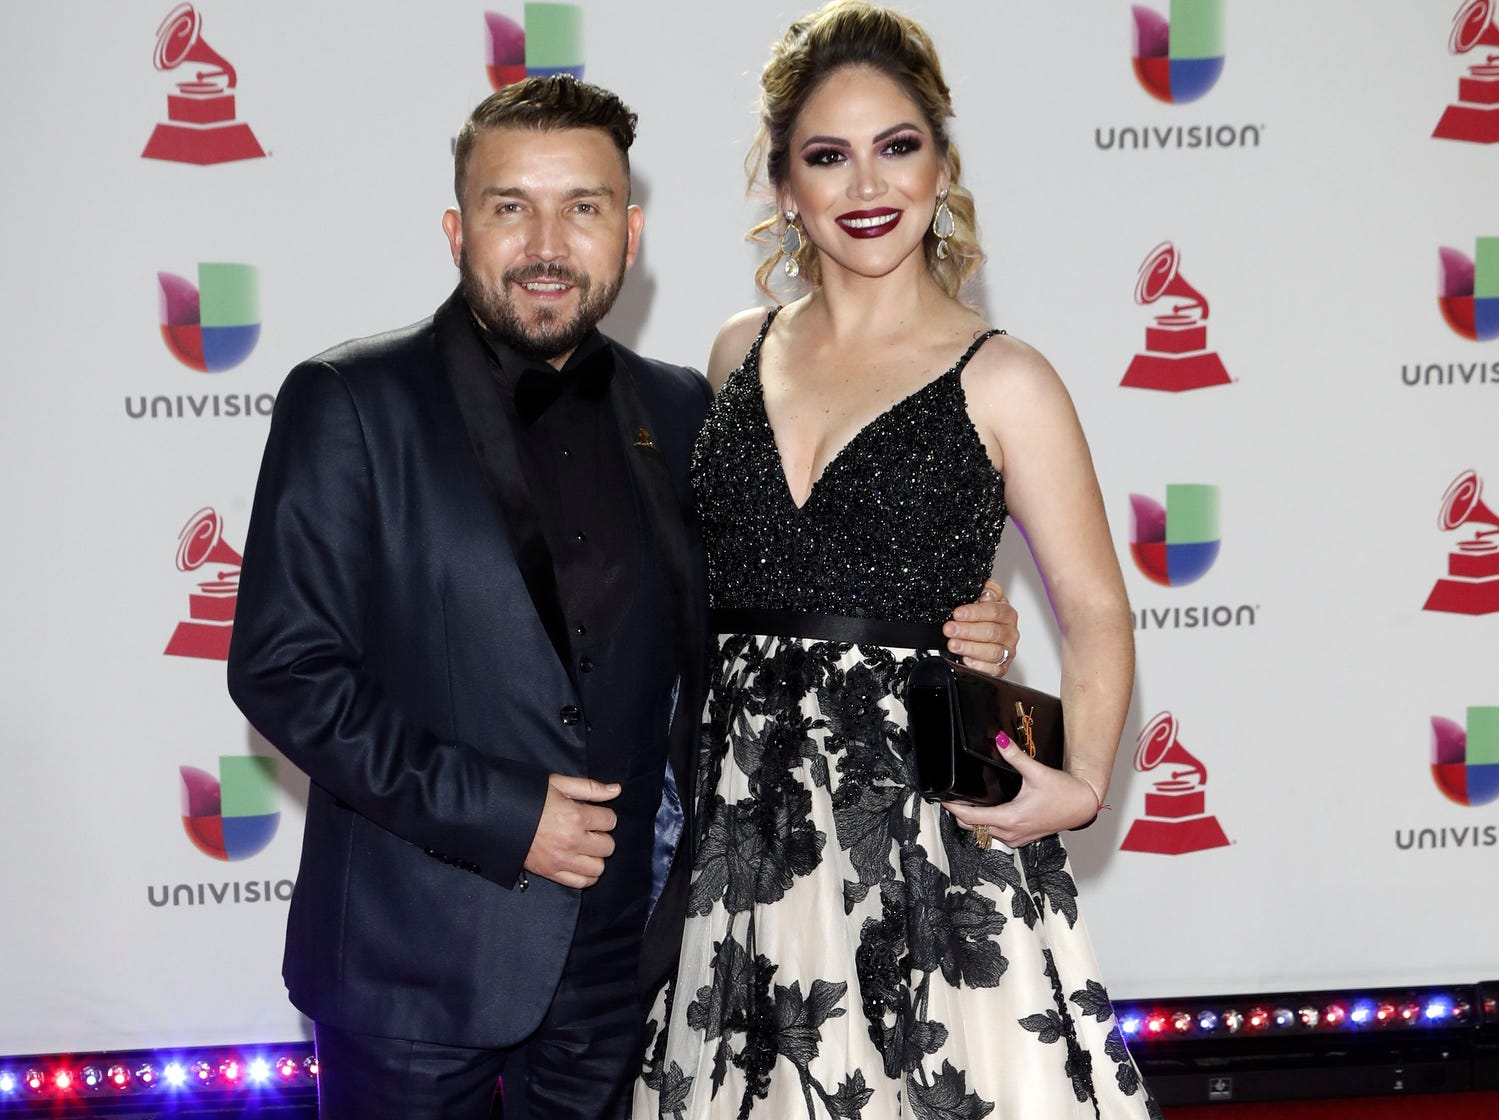 Poncho Lizarraga and wife Celia Correa